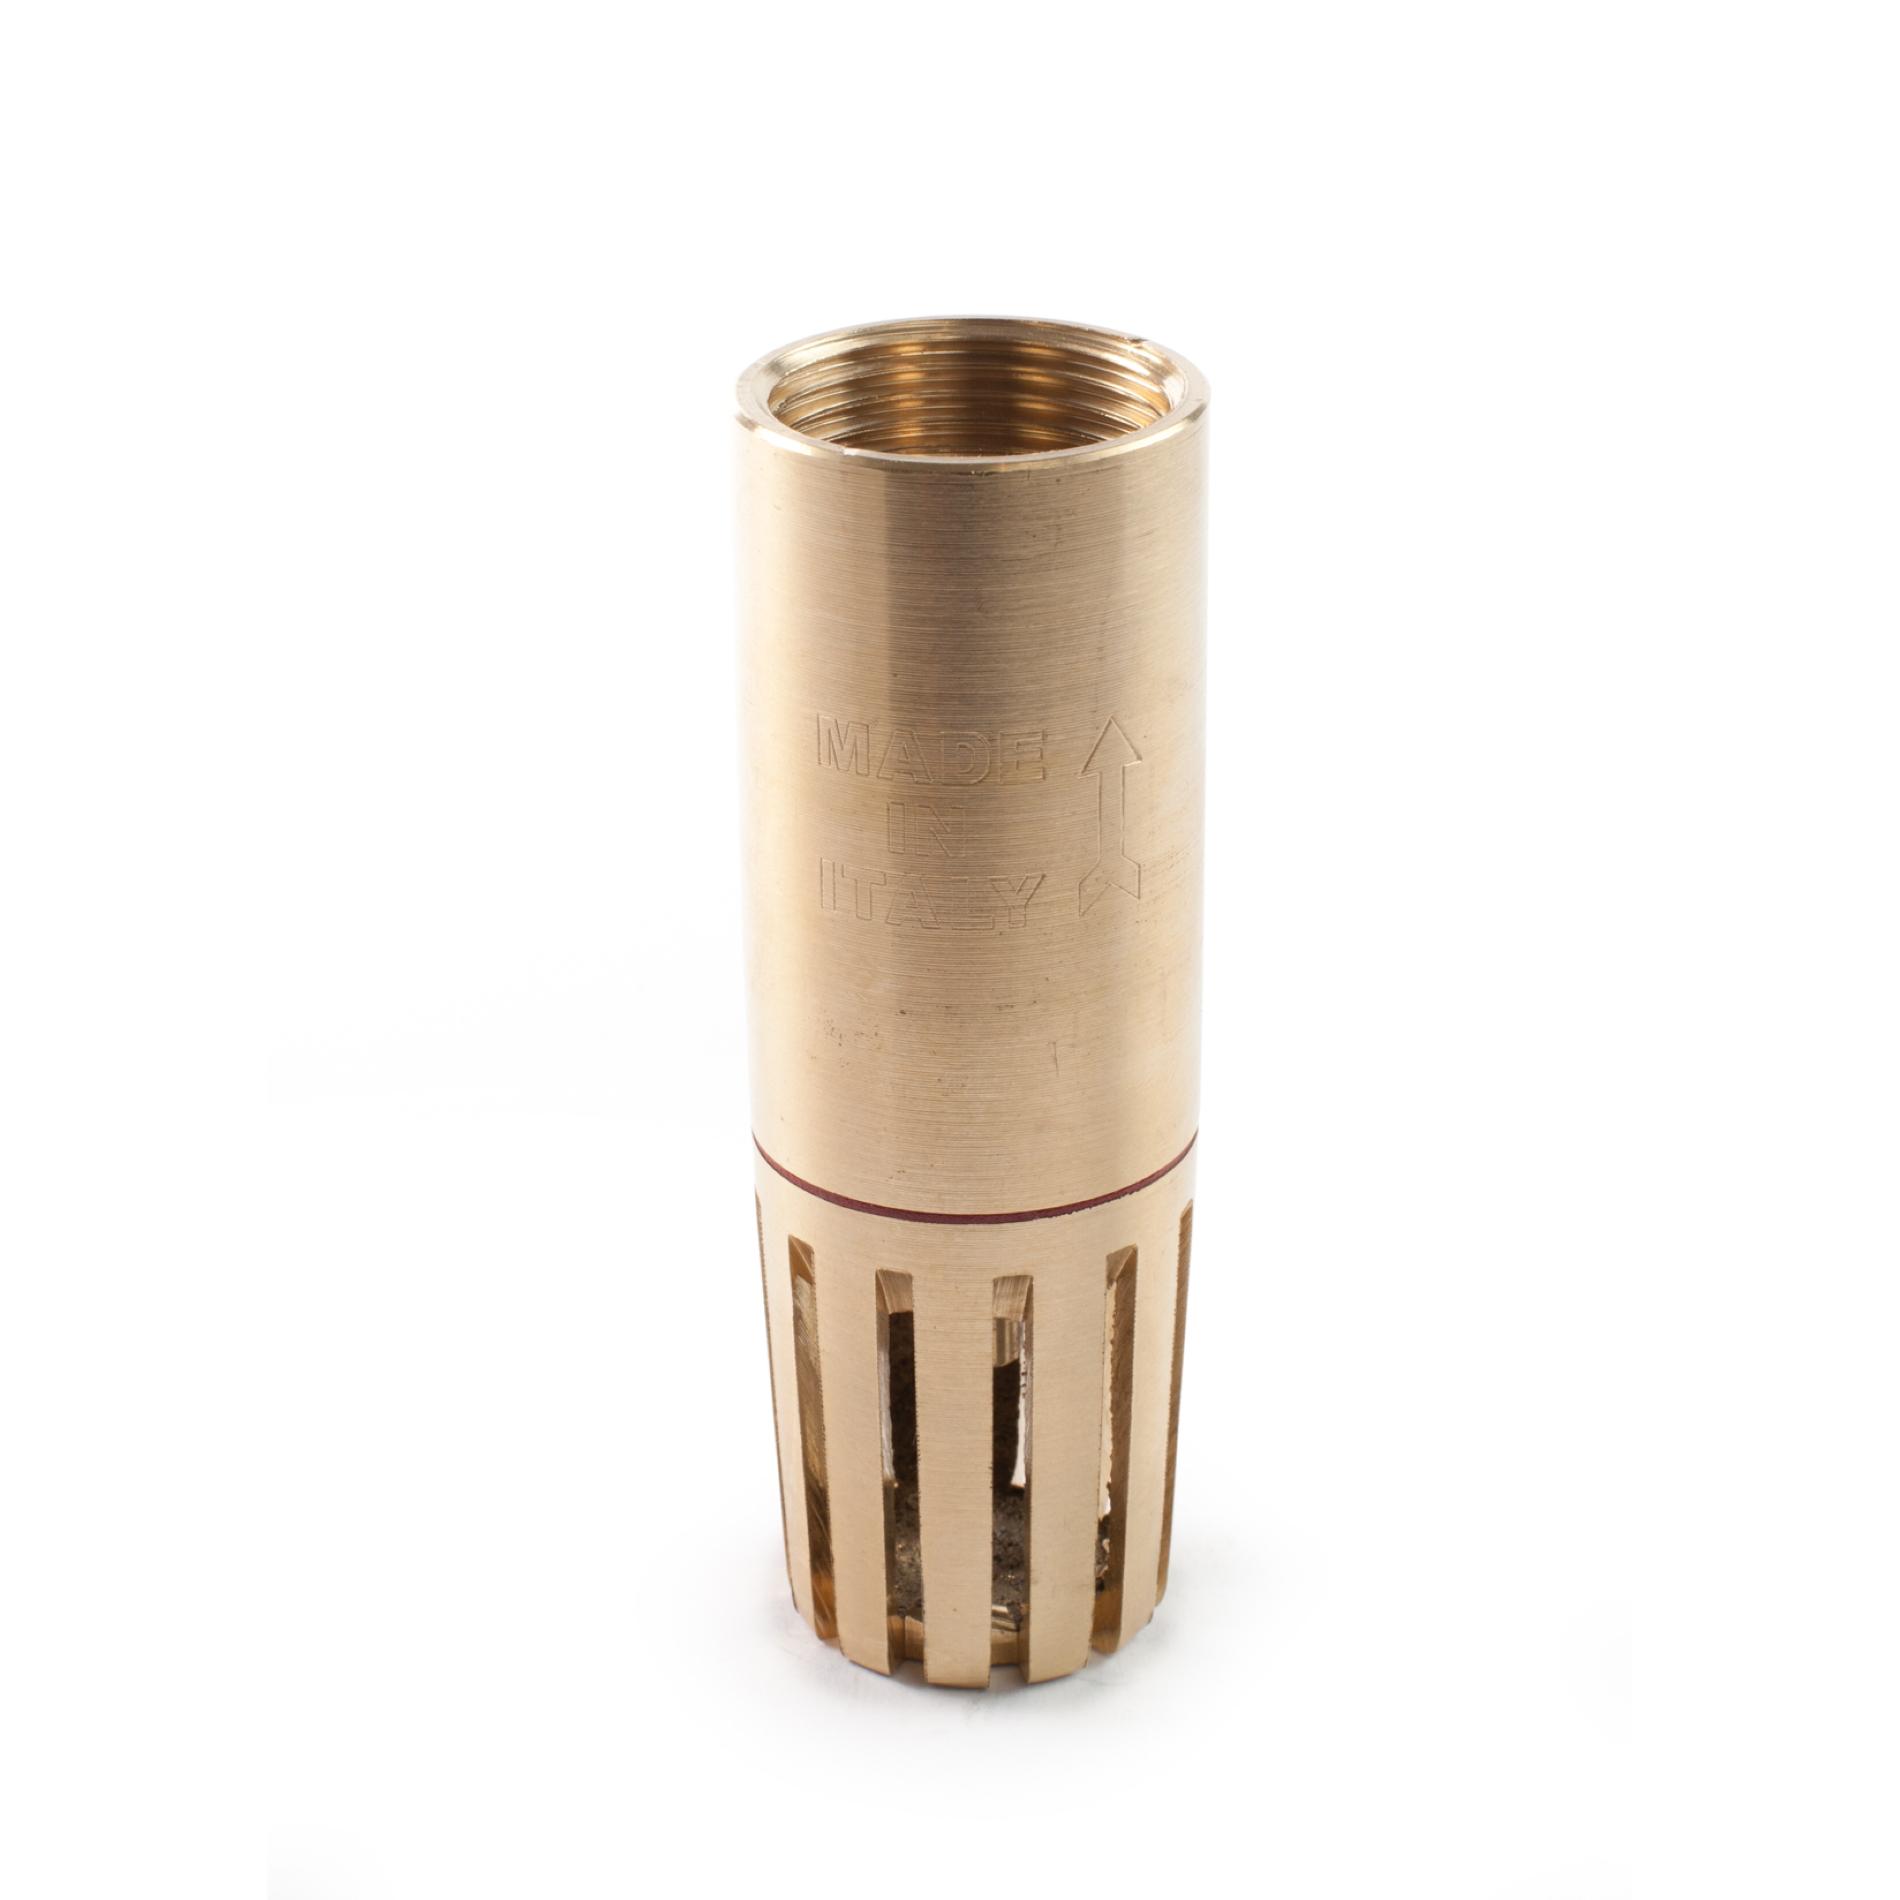 430 Valvola fondo tubolare ottone Brass cilindric foot valve